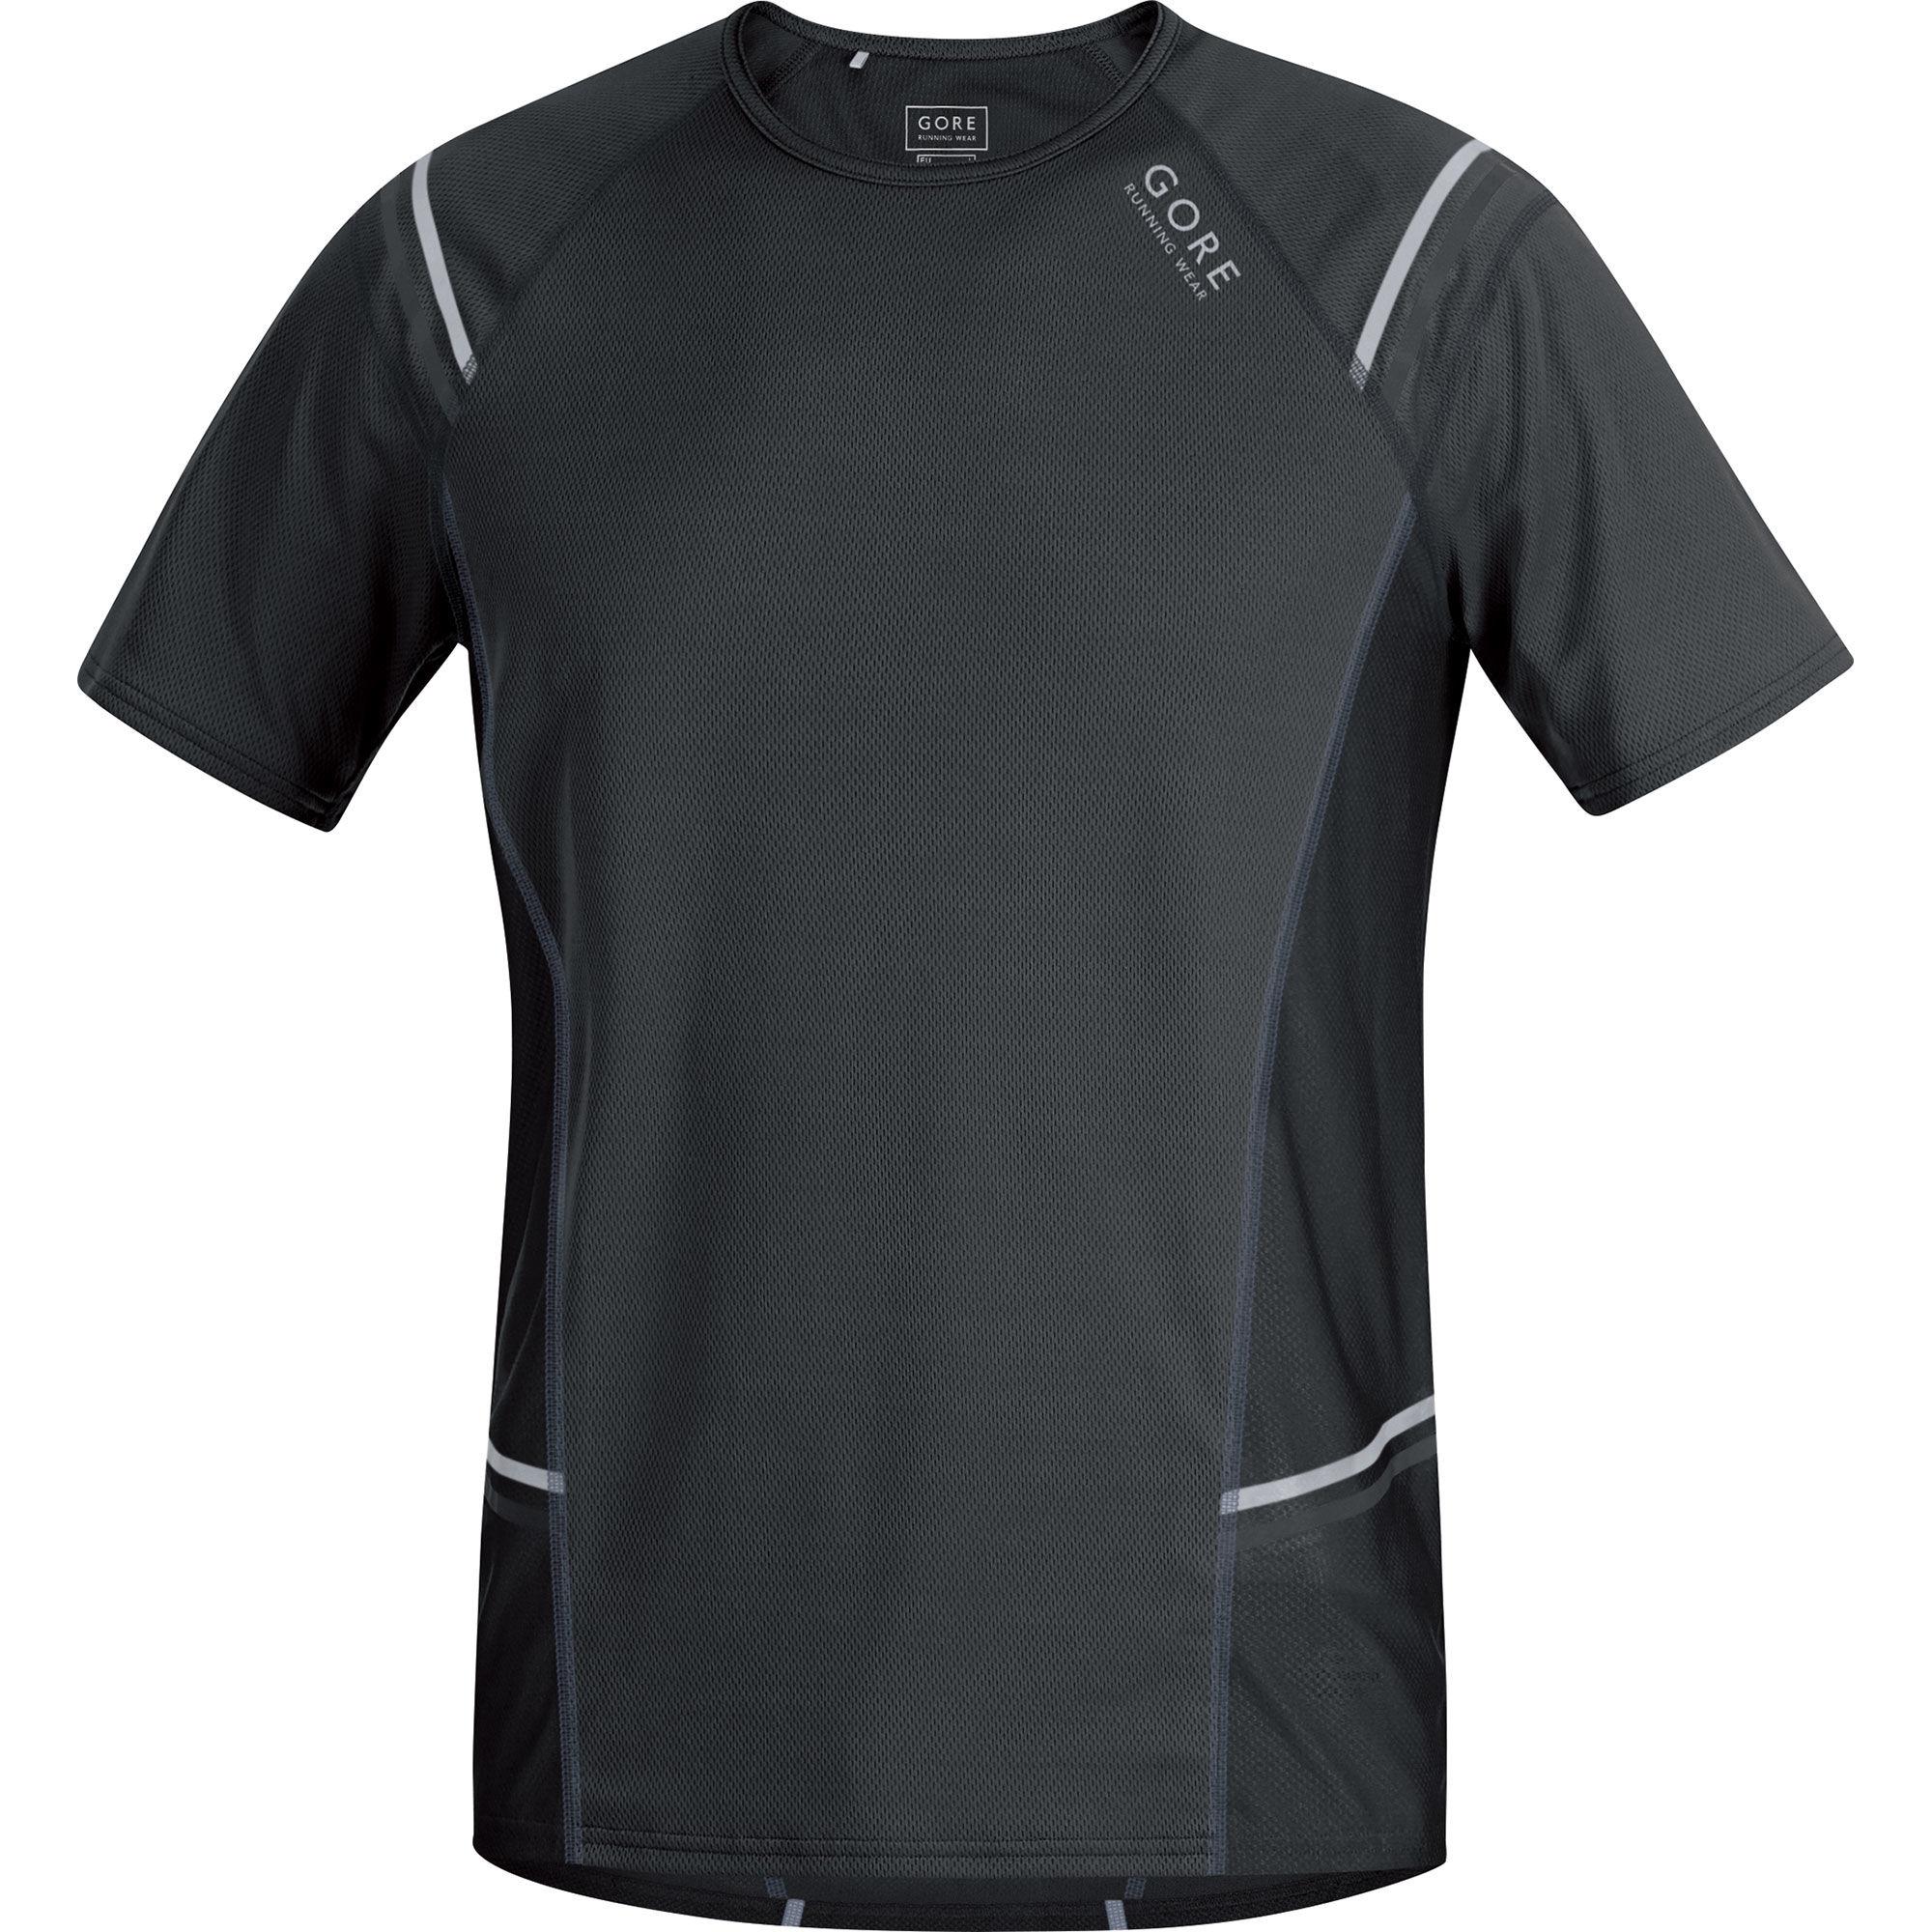 Gore Mythos 6.0 Shirt in Schwarz